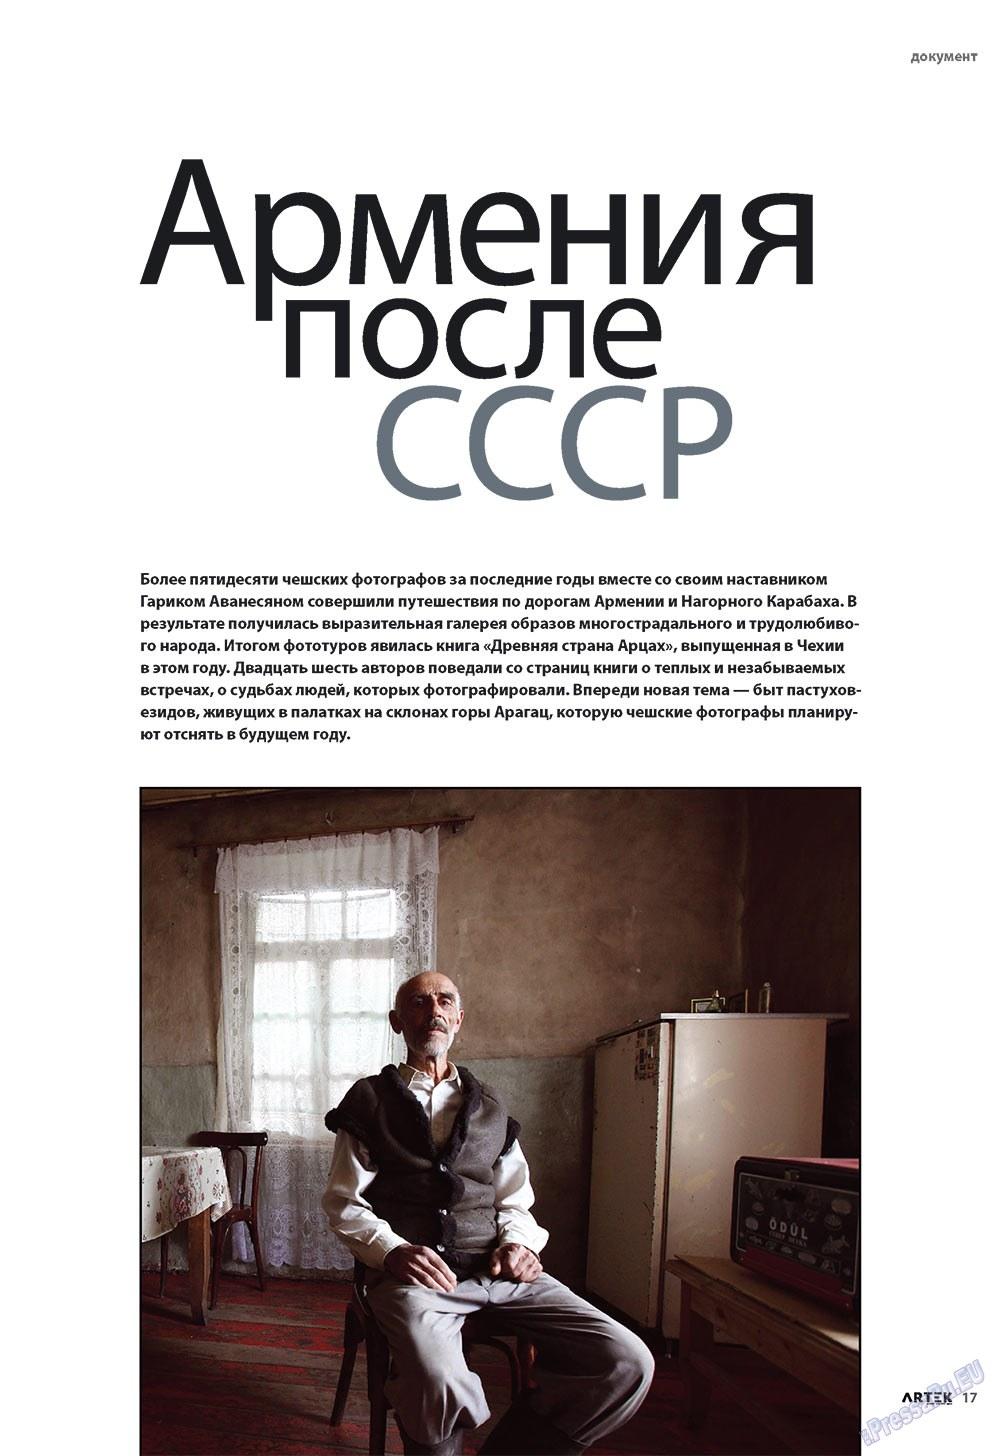 Артек (журнал). 2009 год, номер 5, стр. 17